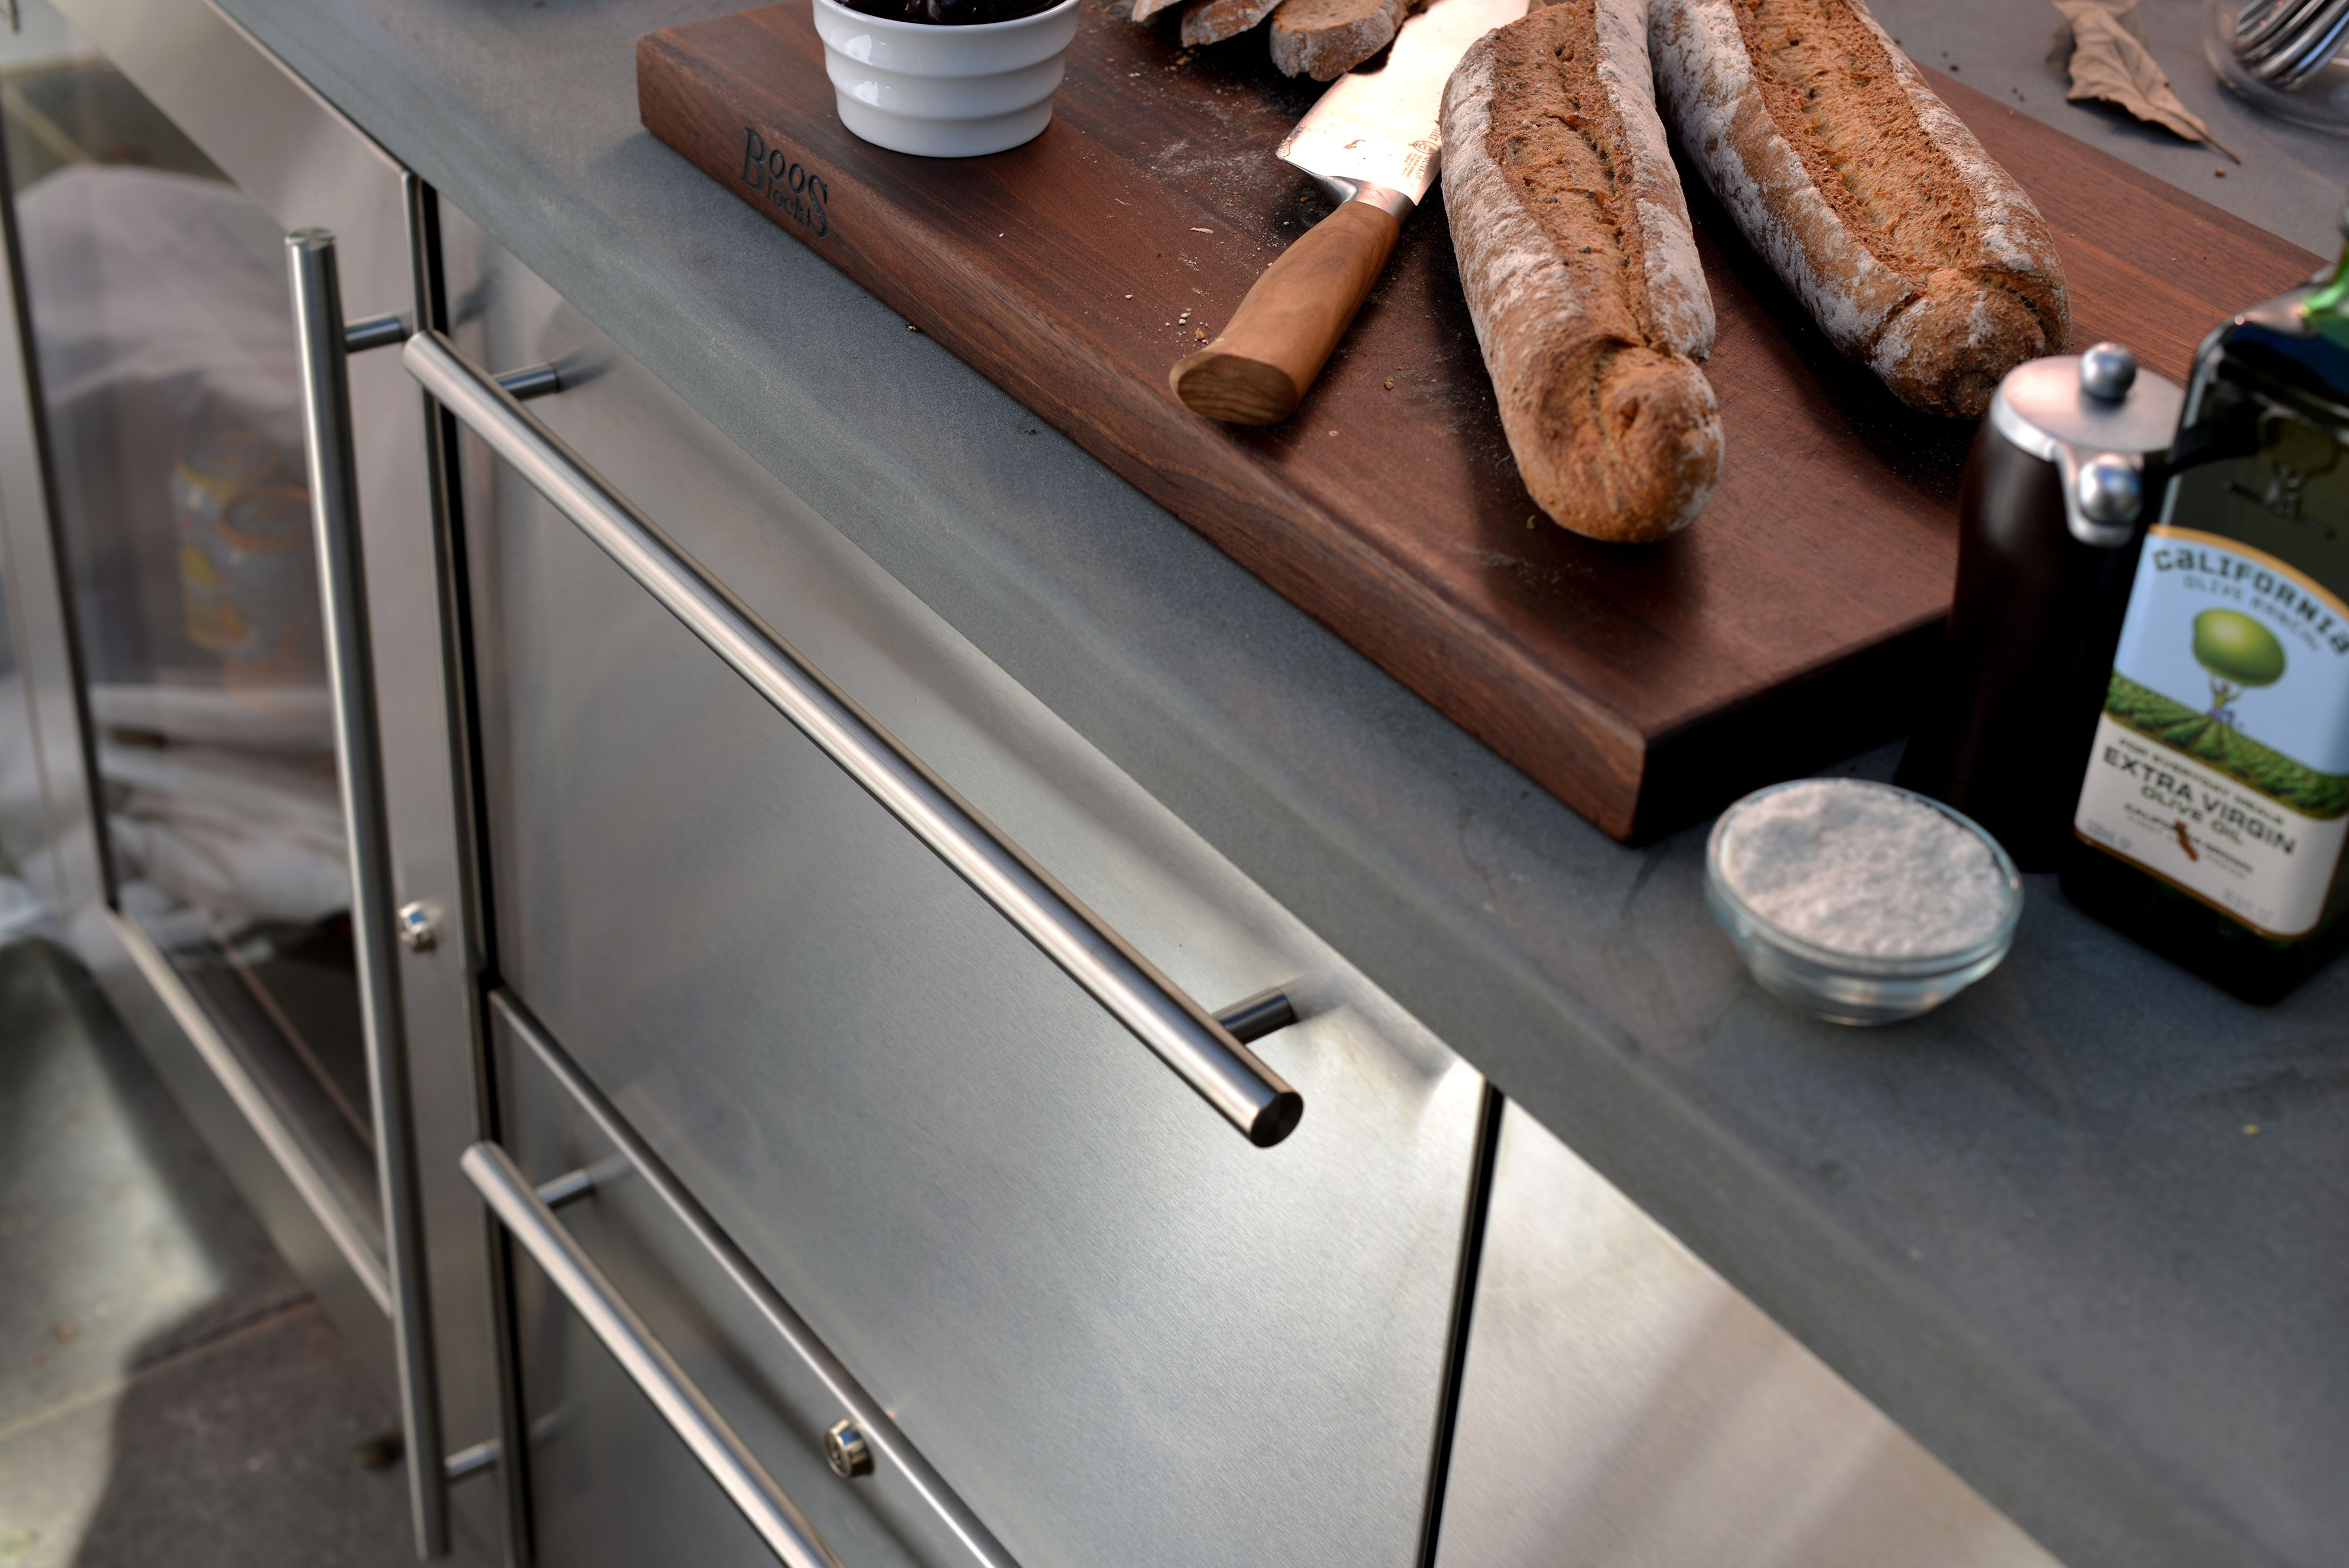 Kalamazoo Outdoor Gourmet Freezer Drawers For The Ultimate Outdoor Kitchen Outdoor Kitchen Appliances